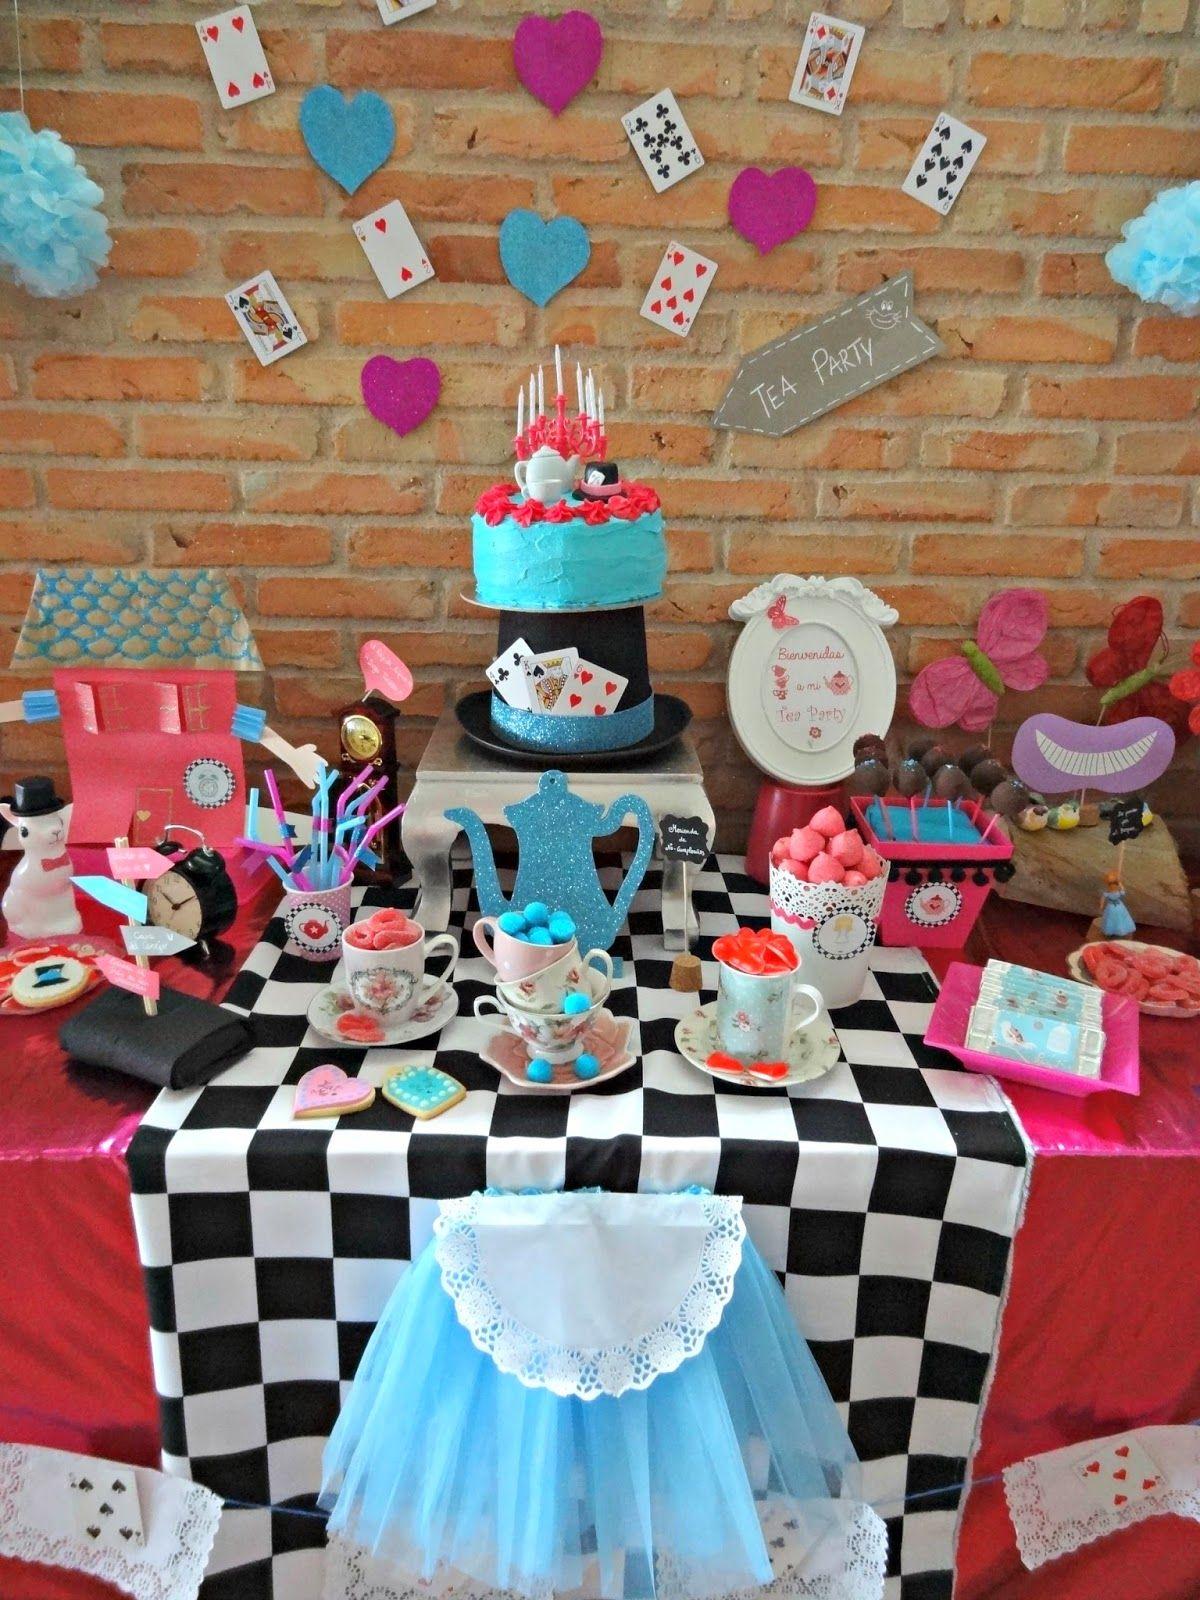 Resultado de imagen para decoracion cumplea os alicia en for Decoracion xv anos alicia pais maravillas